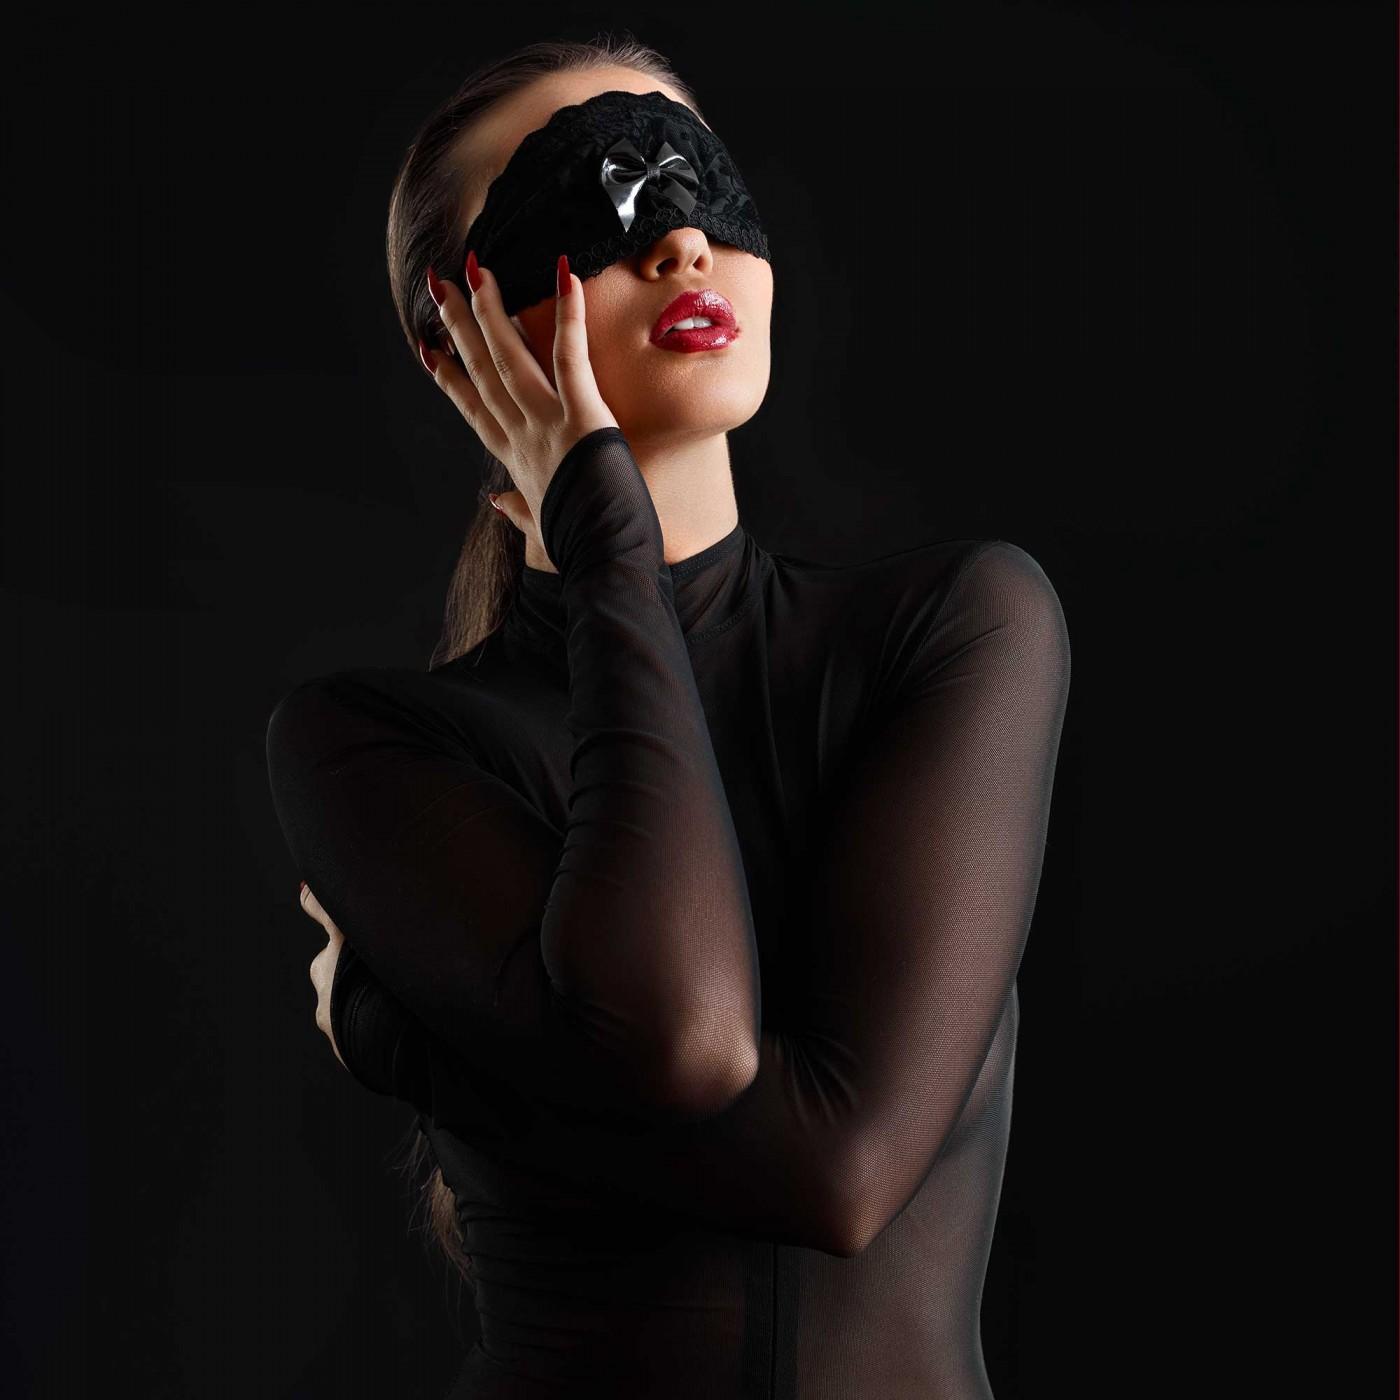 Lou, sexy black lace mask - Patrice Catanzaro